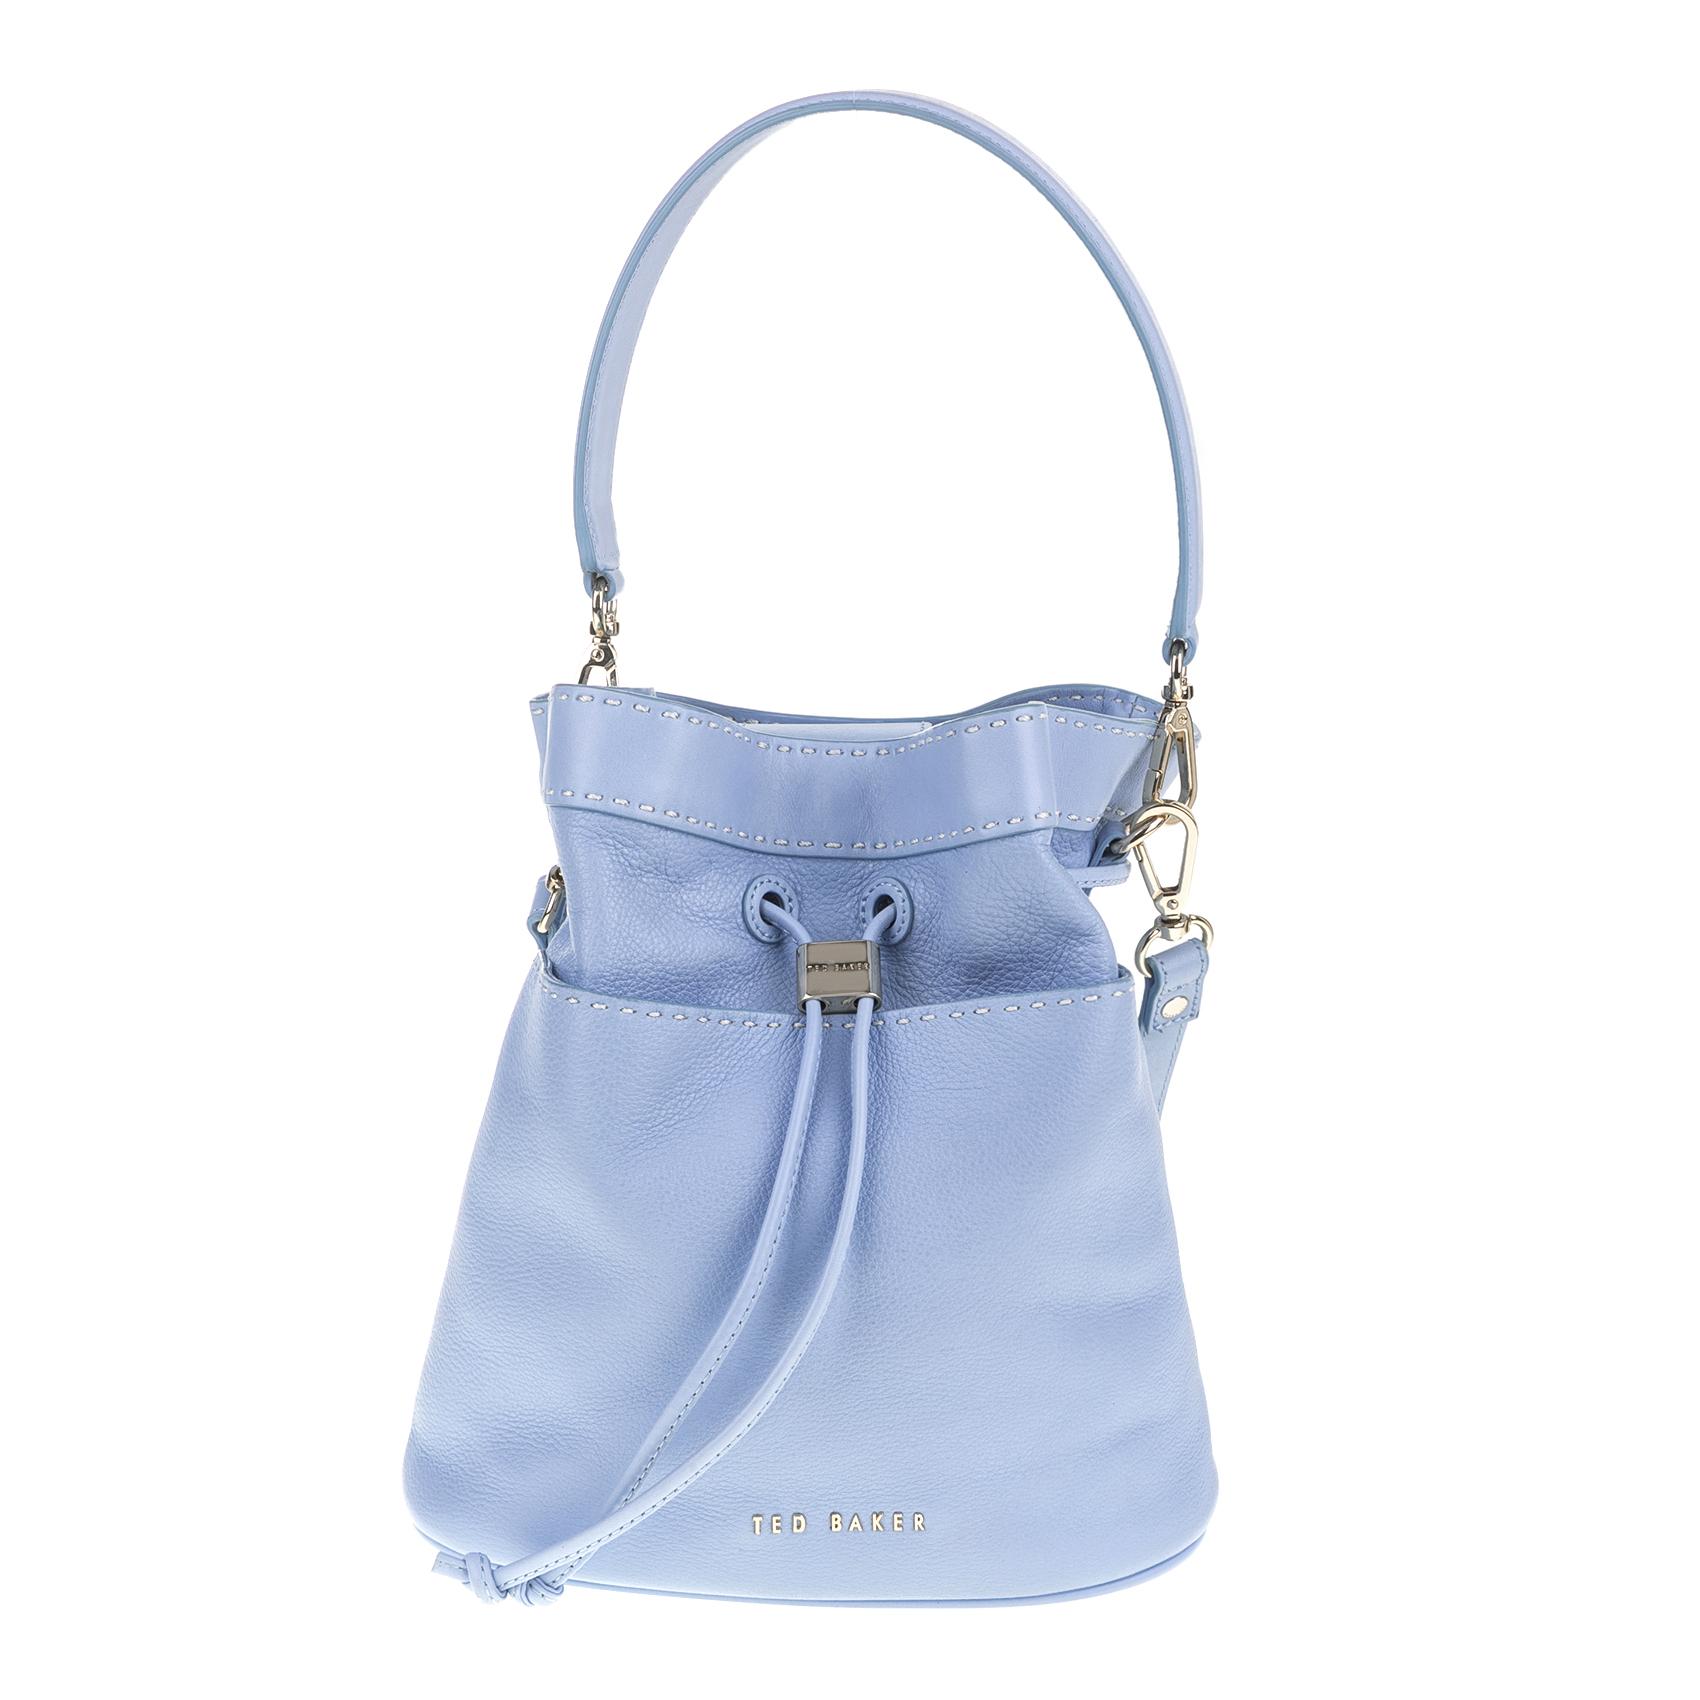 c5df97915c TED BAKER - Γυναικεία τσάντα TED BAKER KASHIA γαλάζια